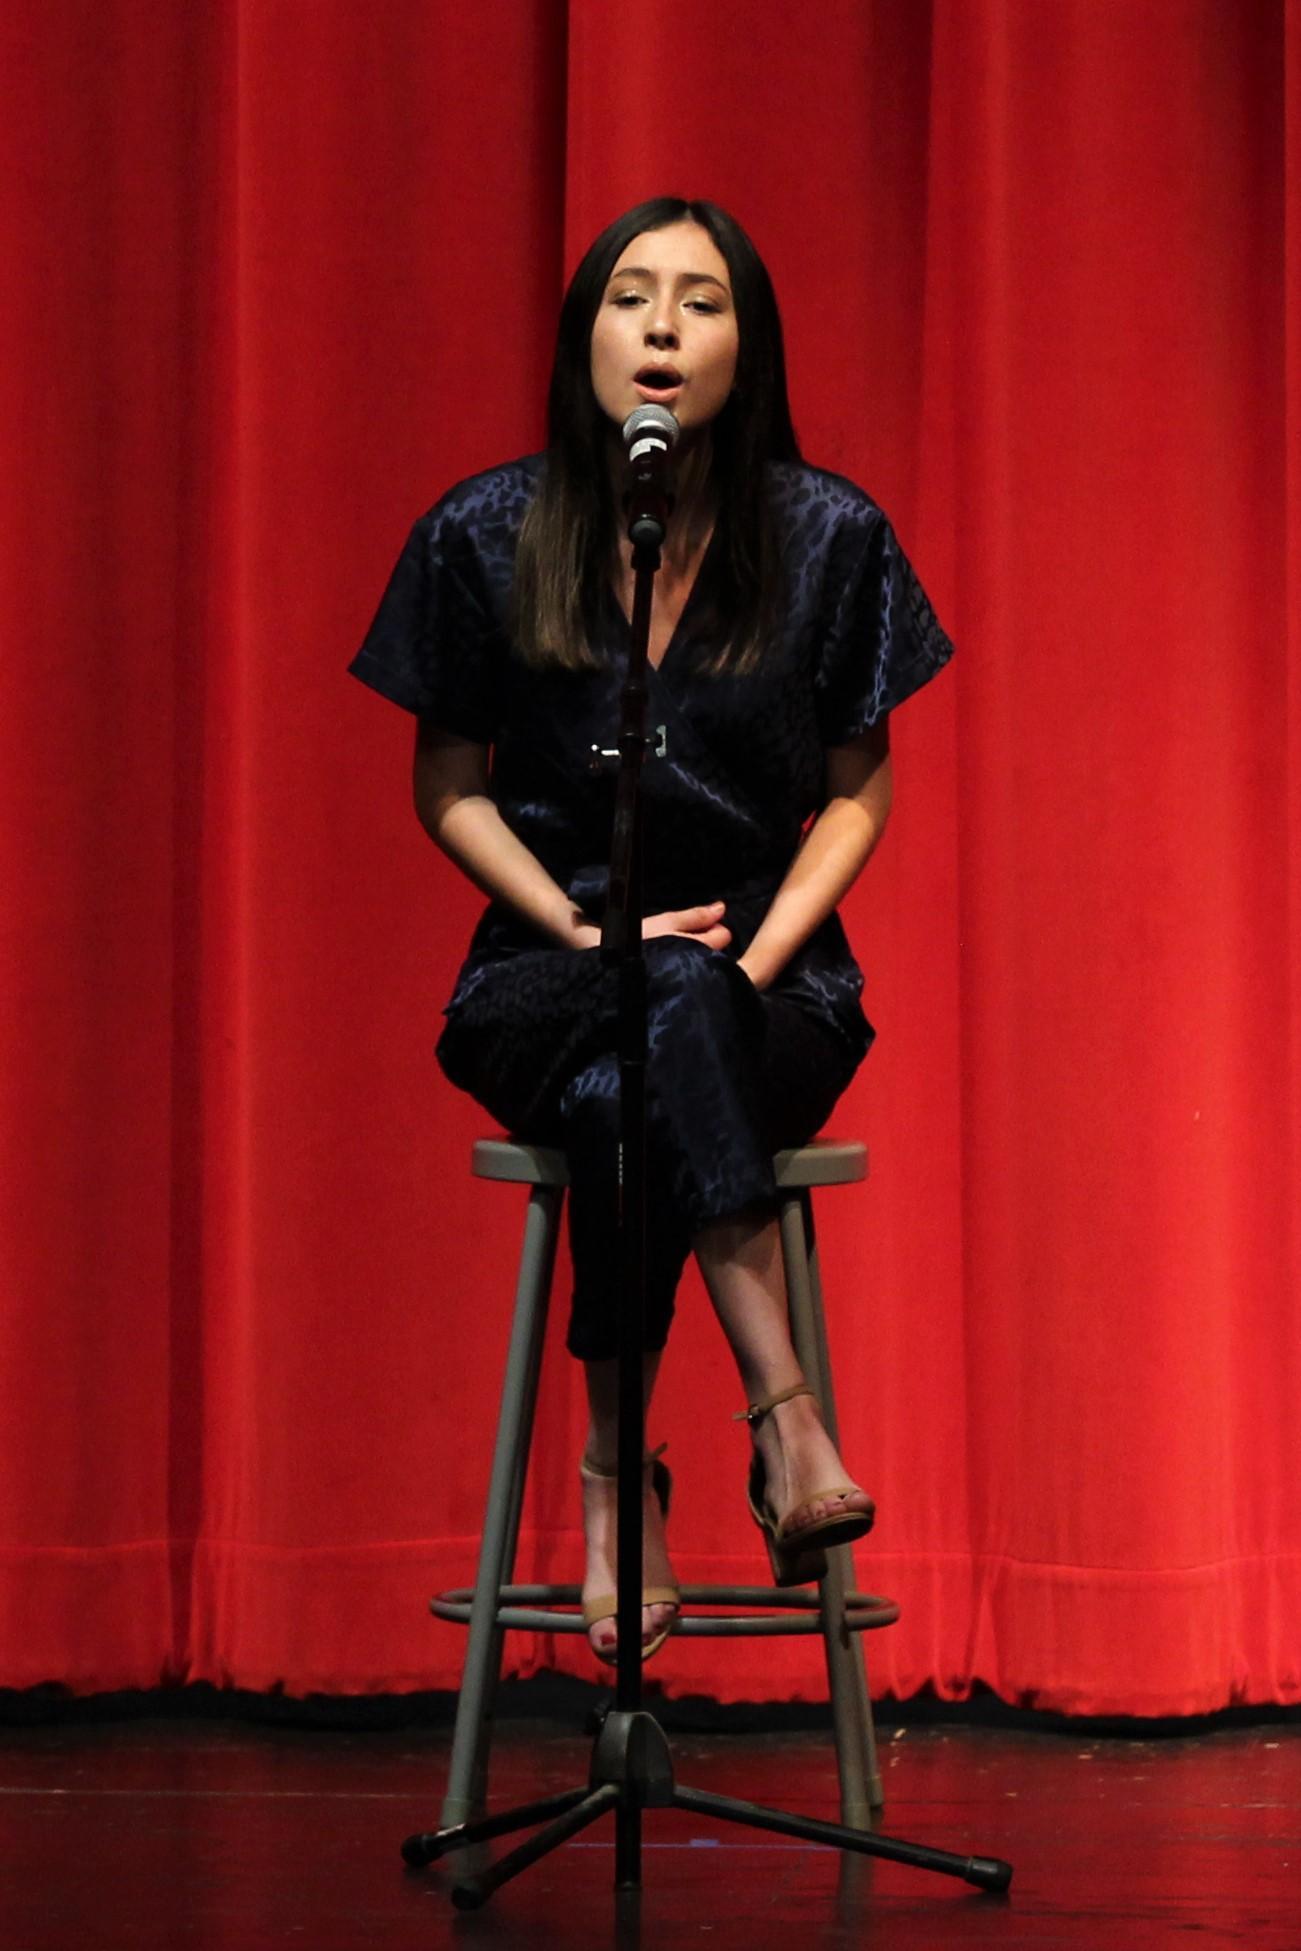 Lexi Montez singing at the talent show